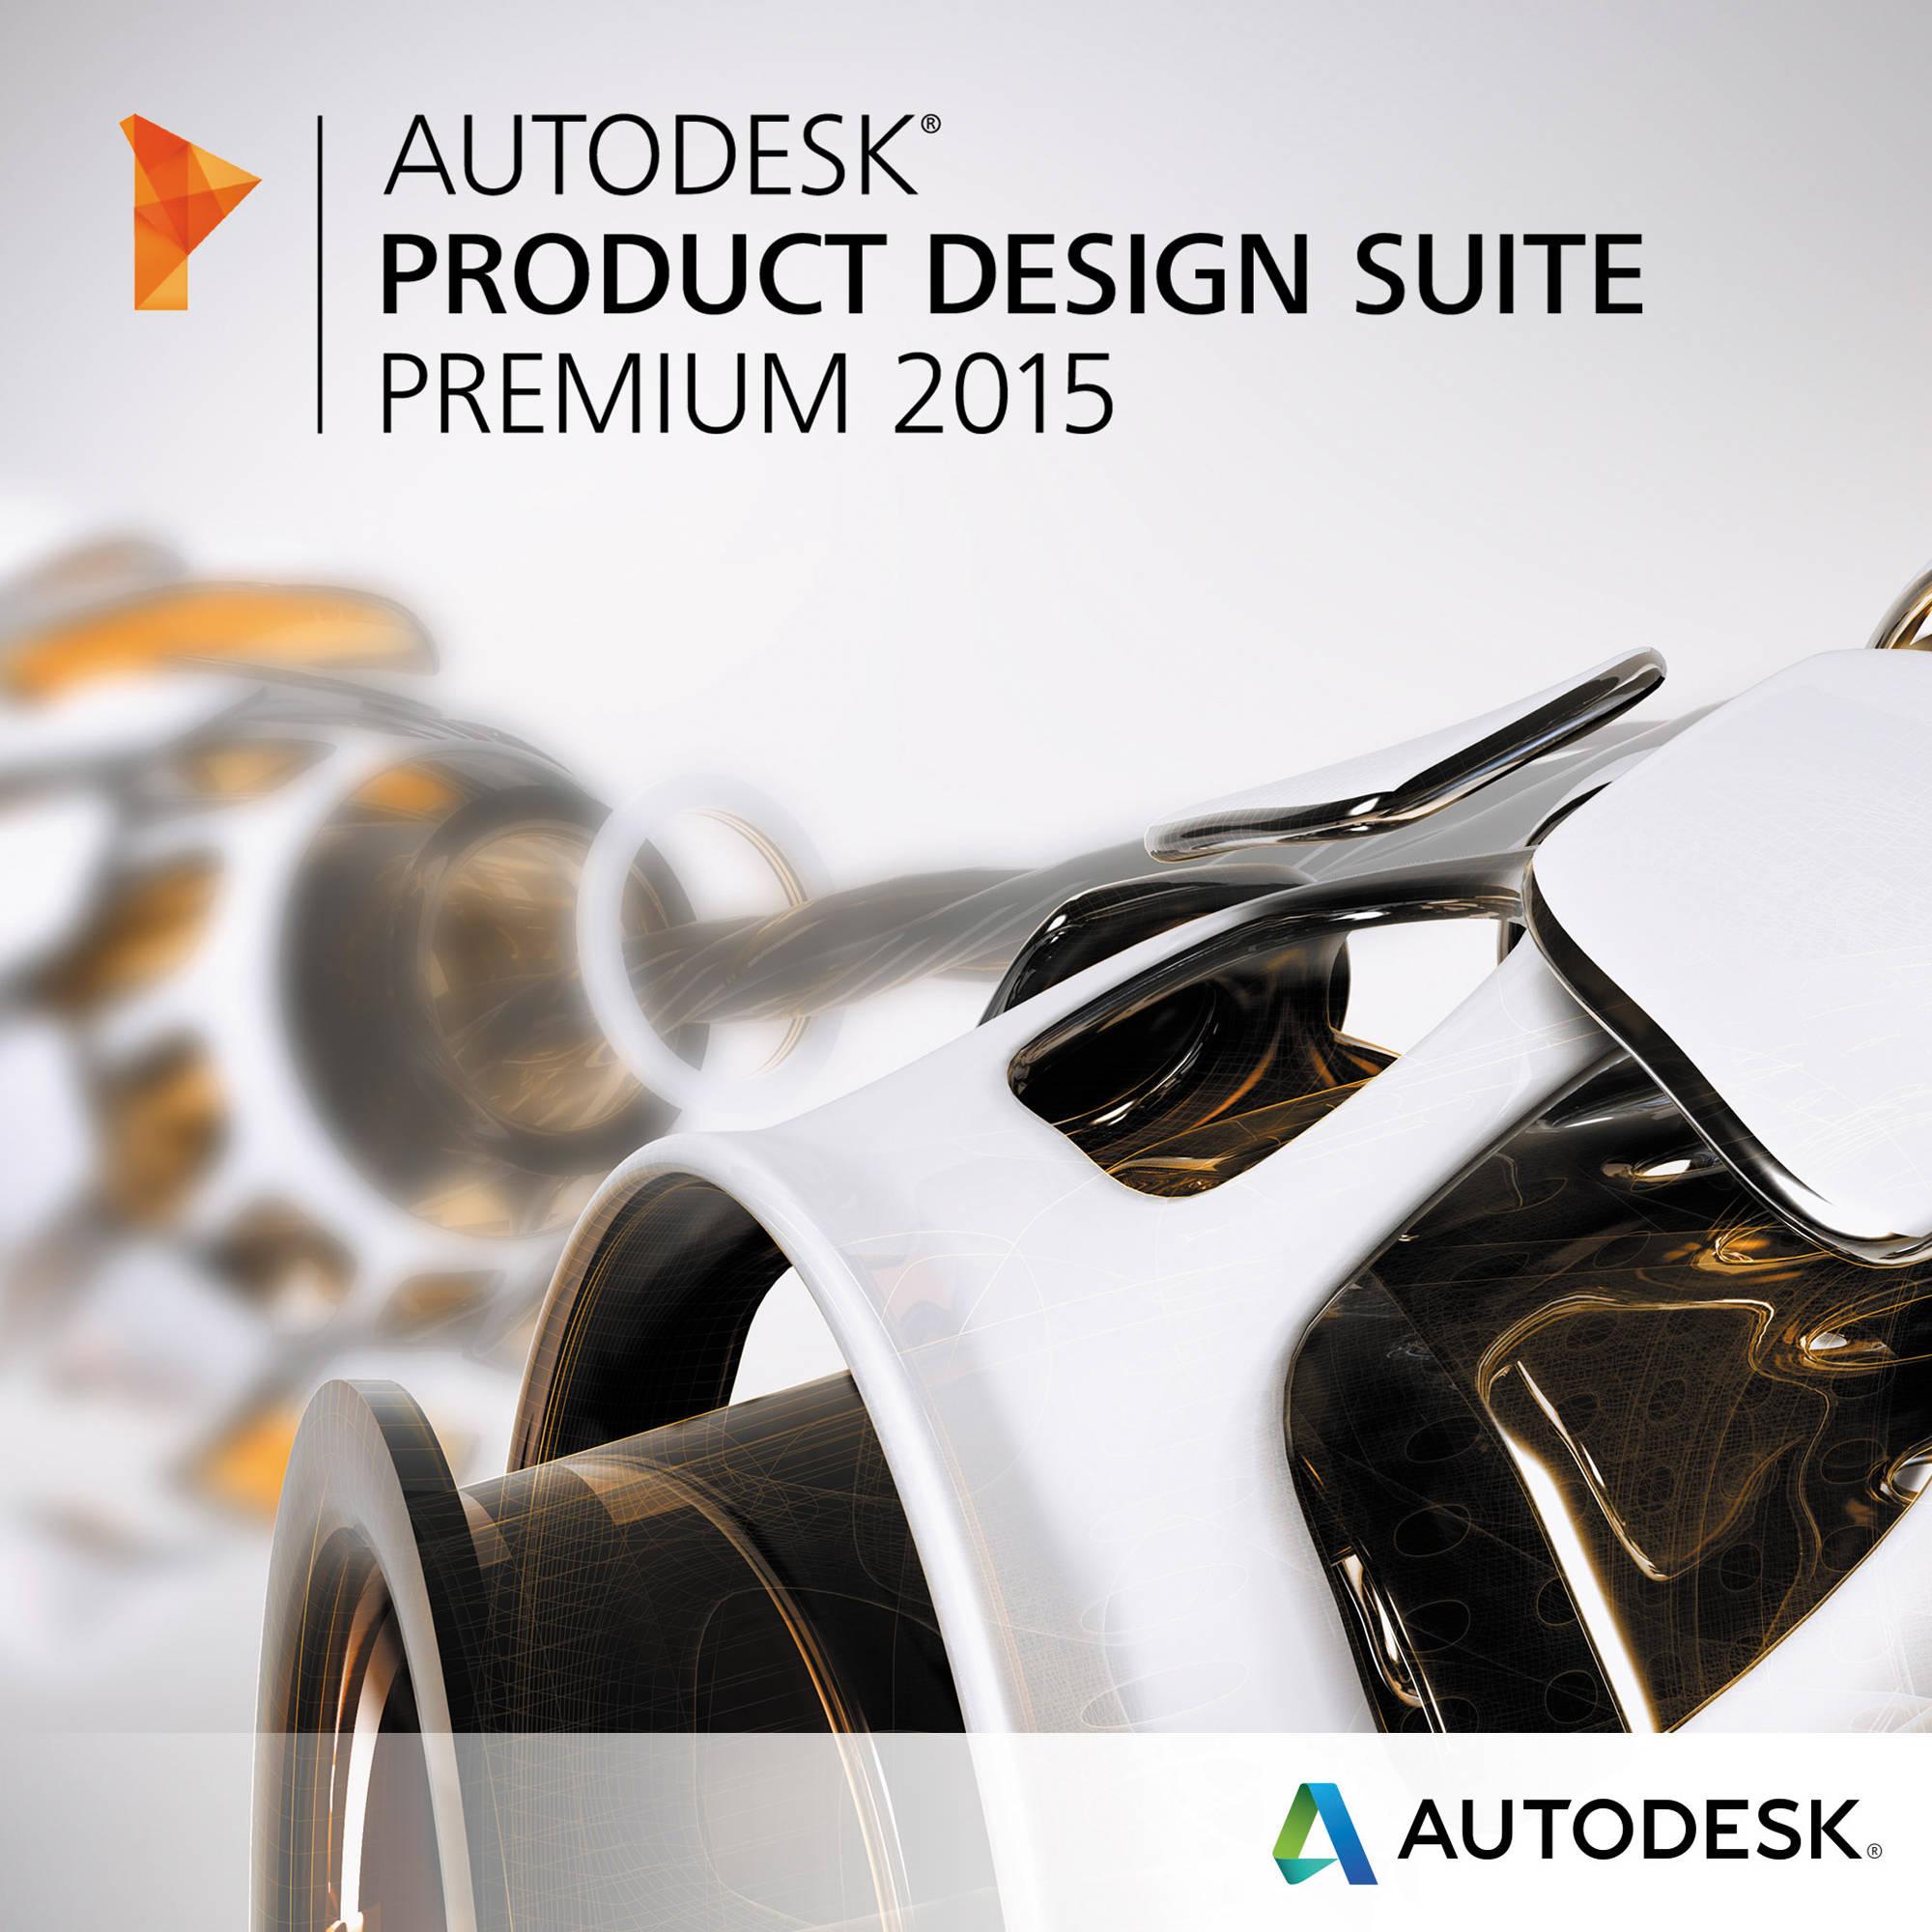 autodesk design suite premium 2015 download 768g1 wwr111 1001. Black Bedroom Furniture Sets. Home Design Ideas